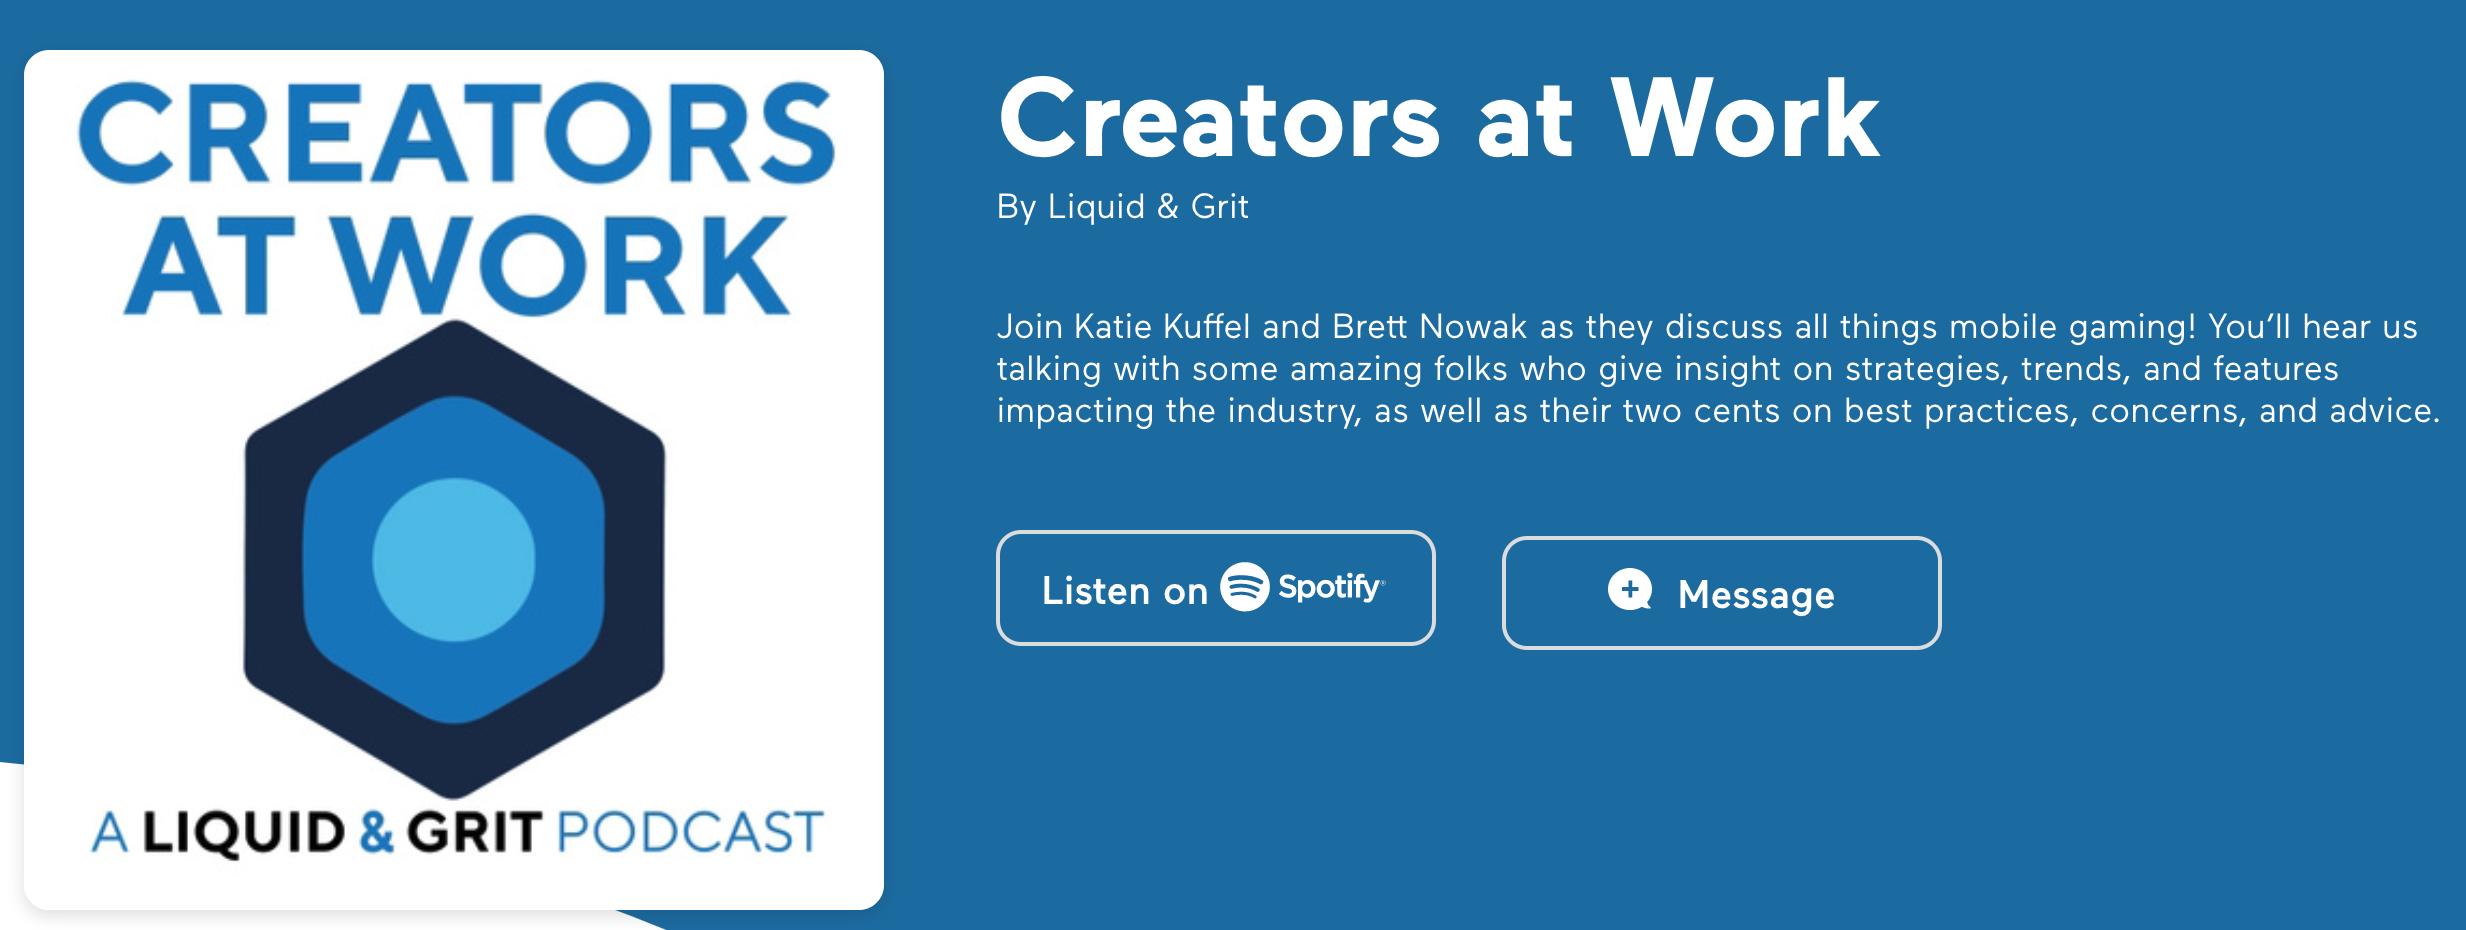 JK on Creators at Work Podcast